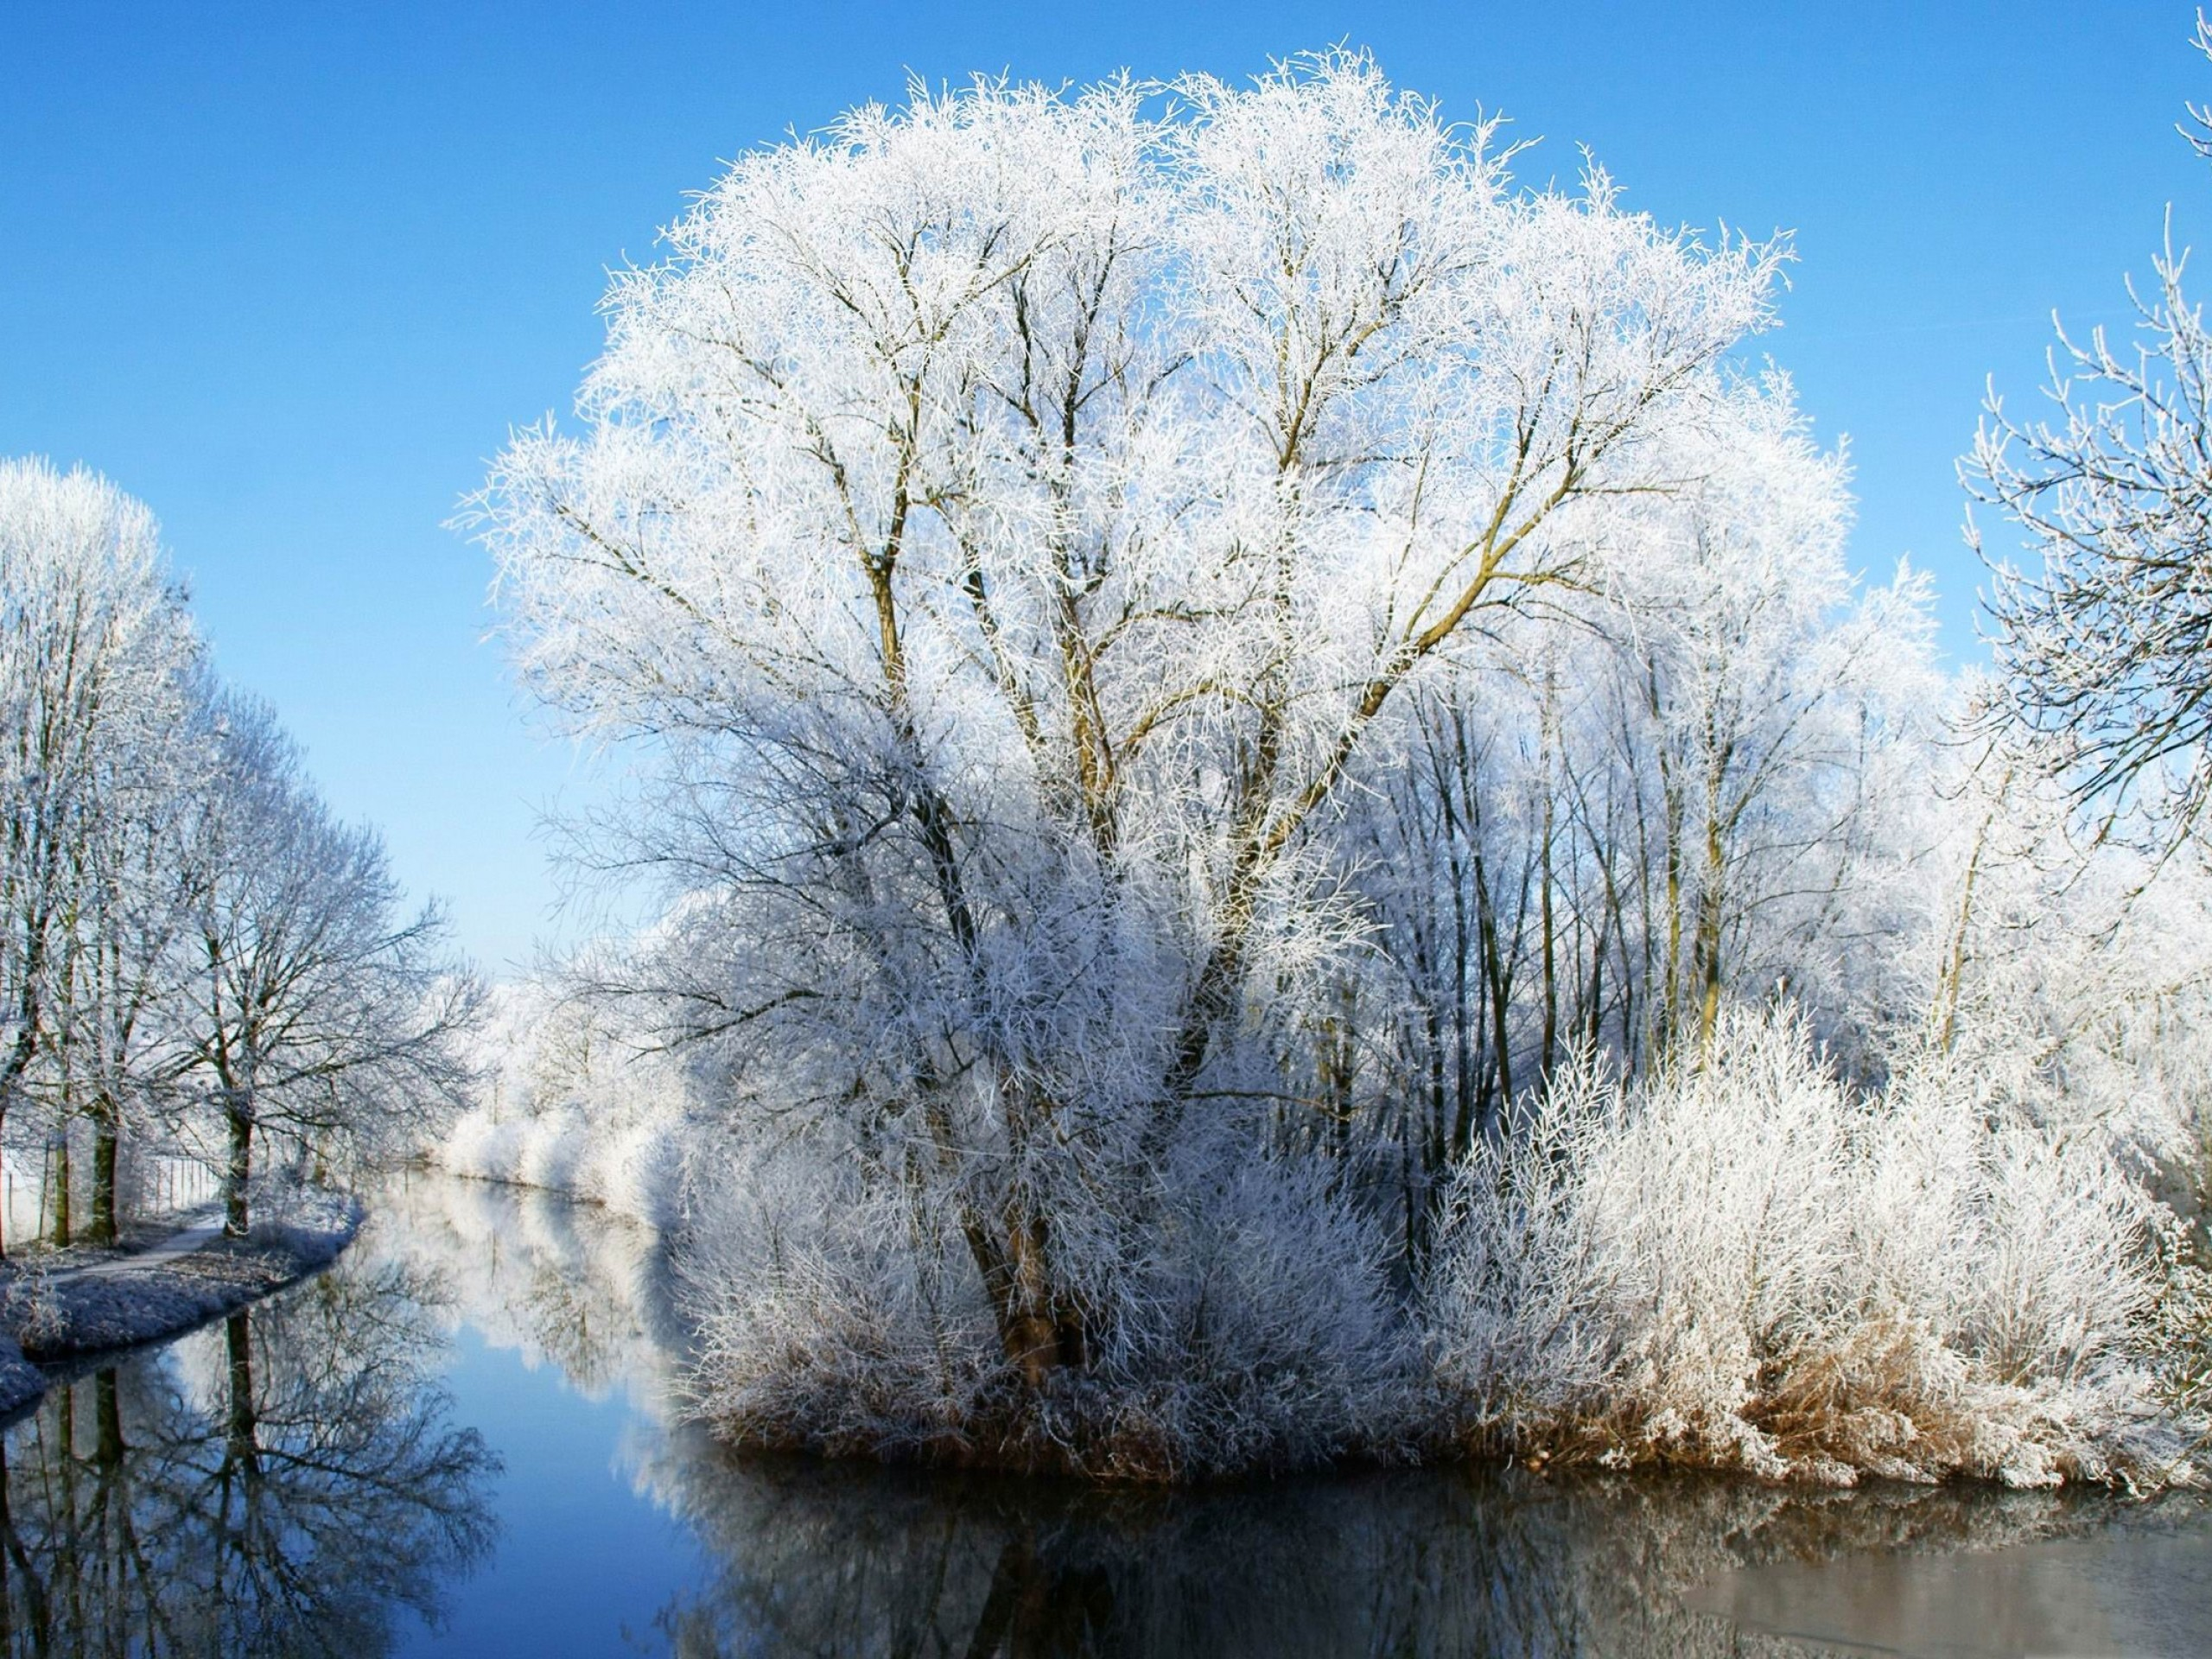 Winter Snow HD Wallpaper Nature Wallpapers 2560x1920